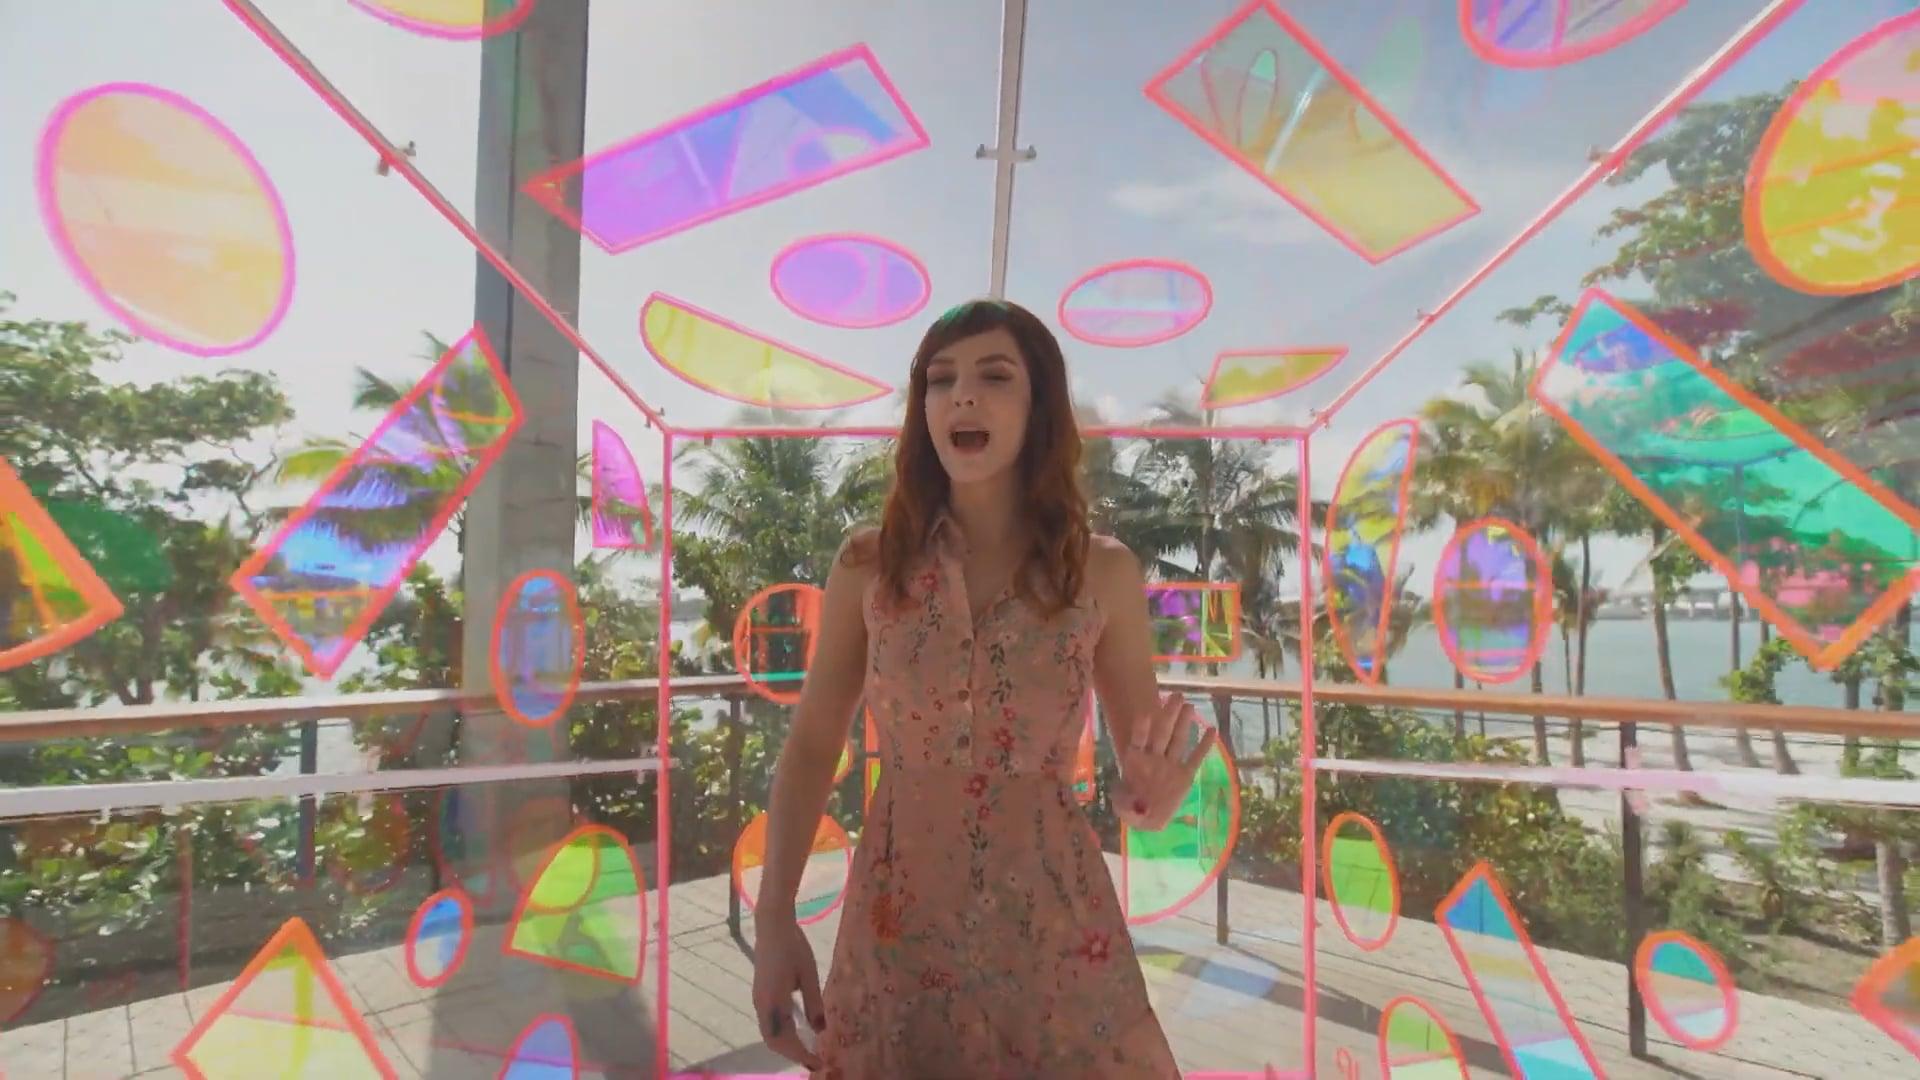 S01 EP02 - Modo Viagem / Miami: Programas que Bombam nas Redes Sociais